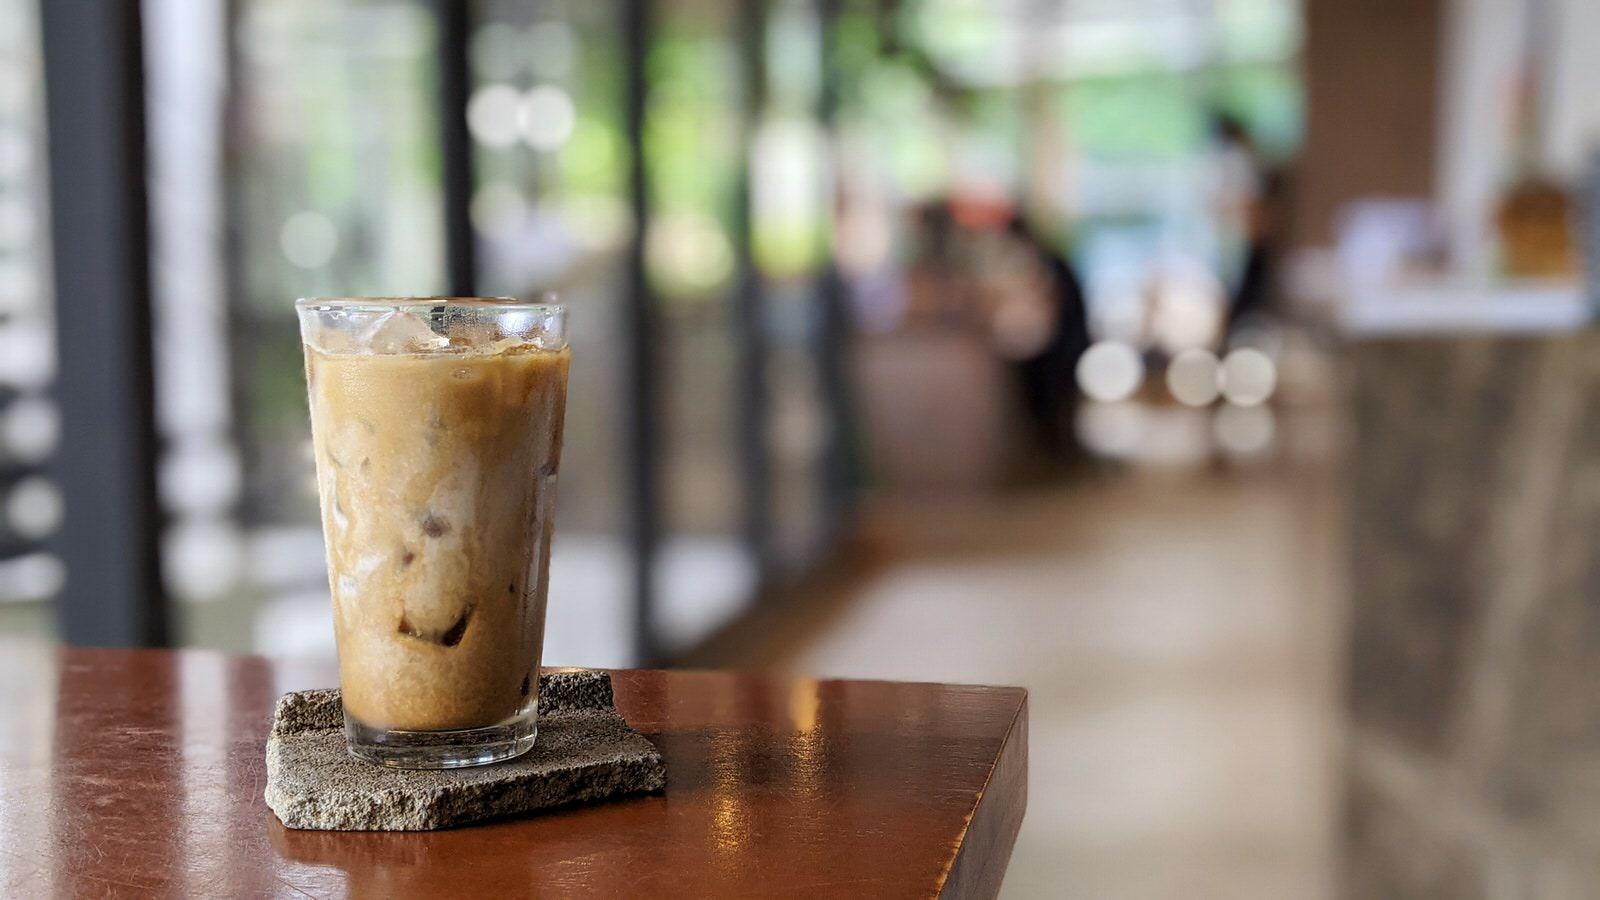 Cafe (taken with Pixel4)